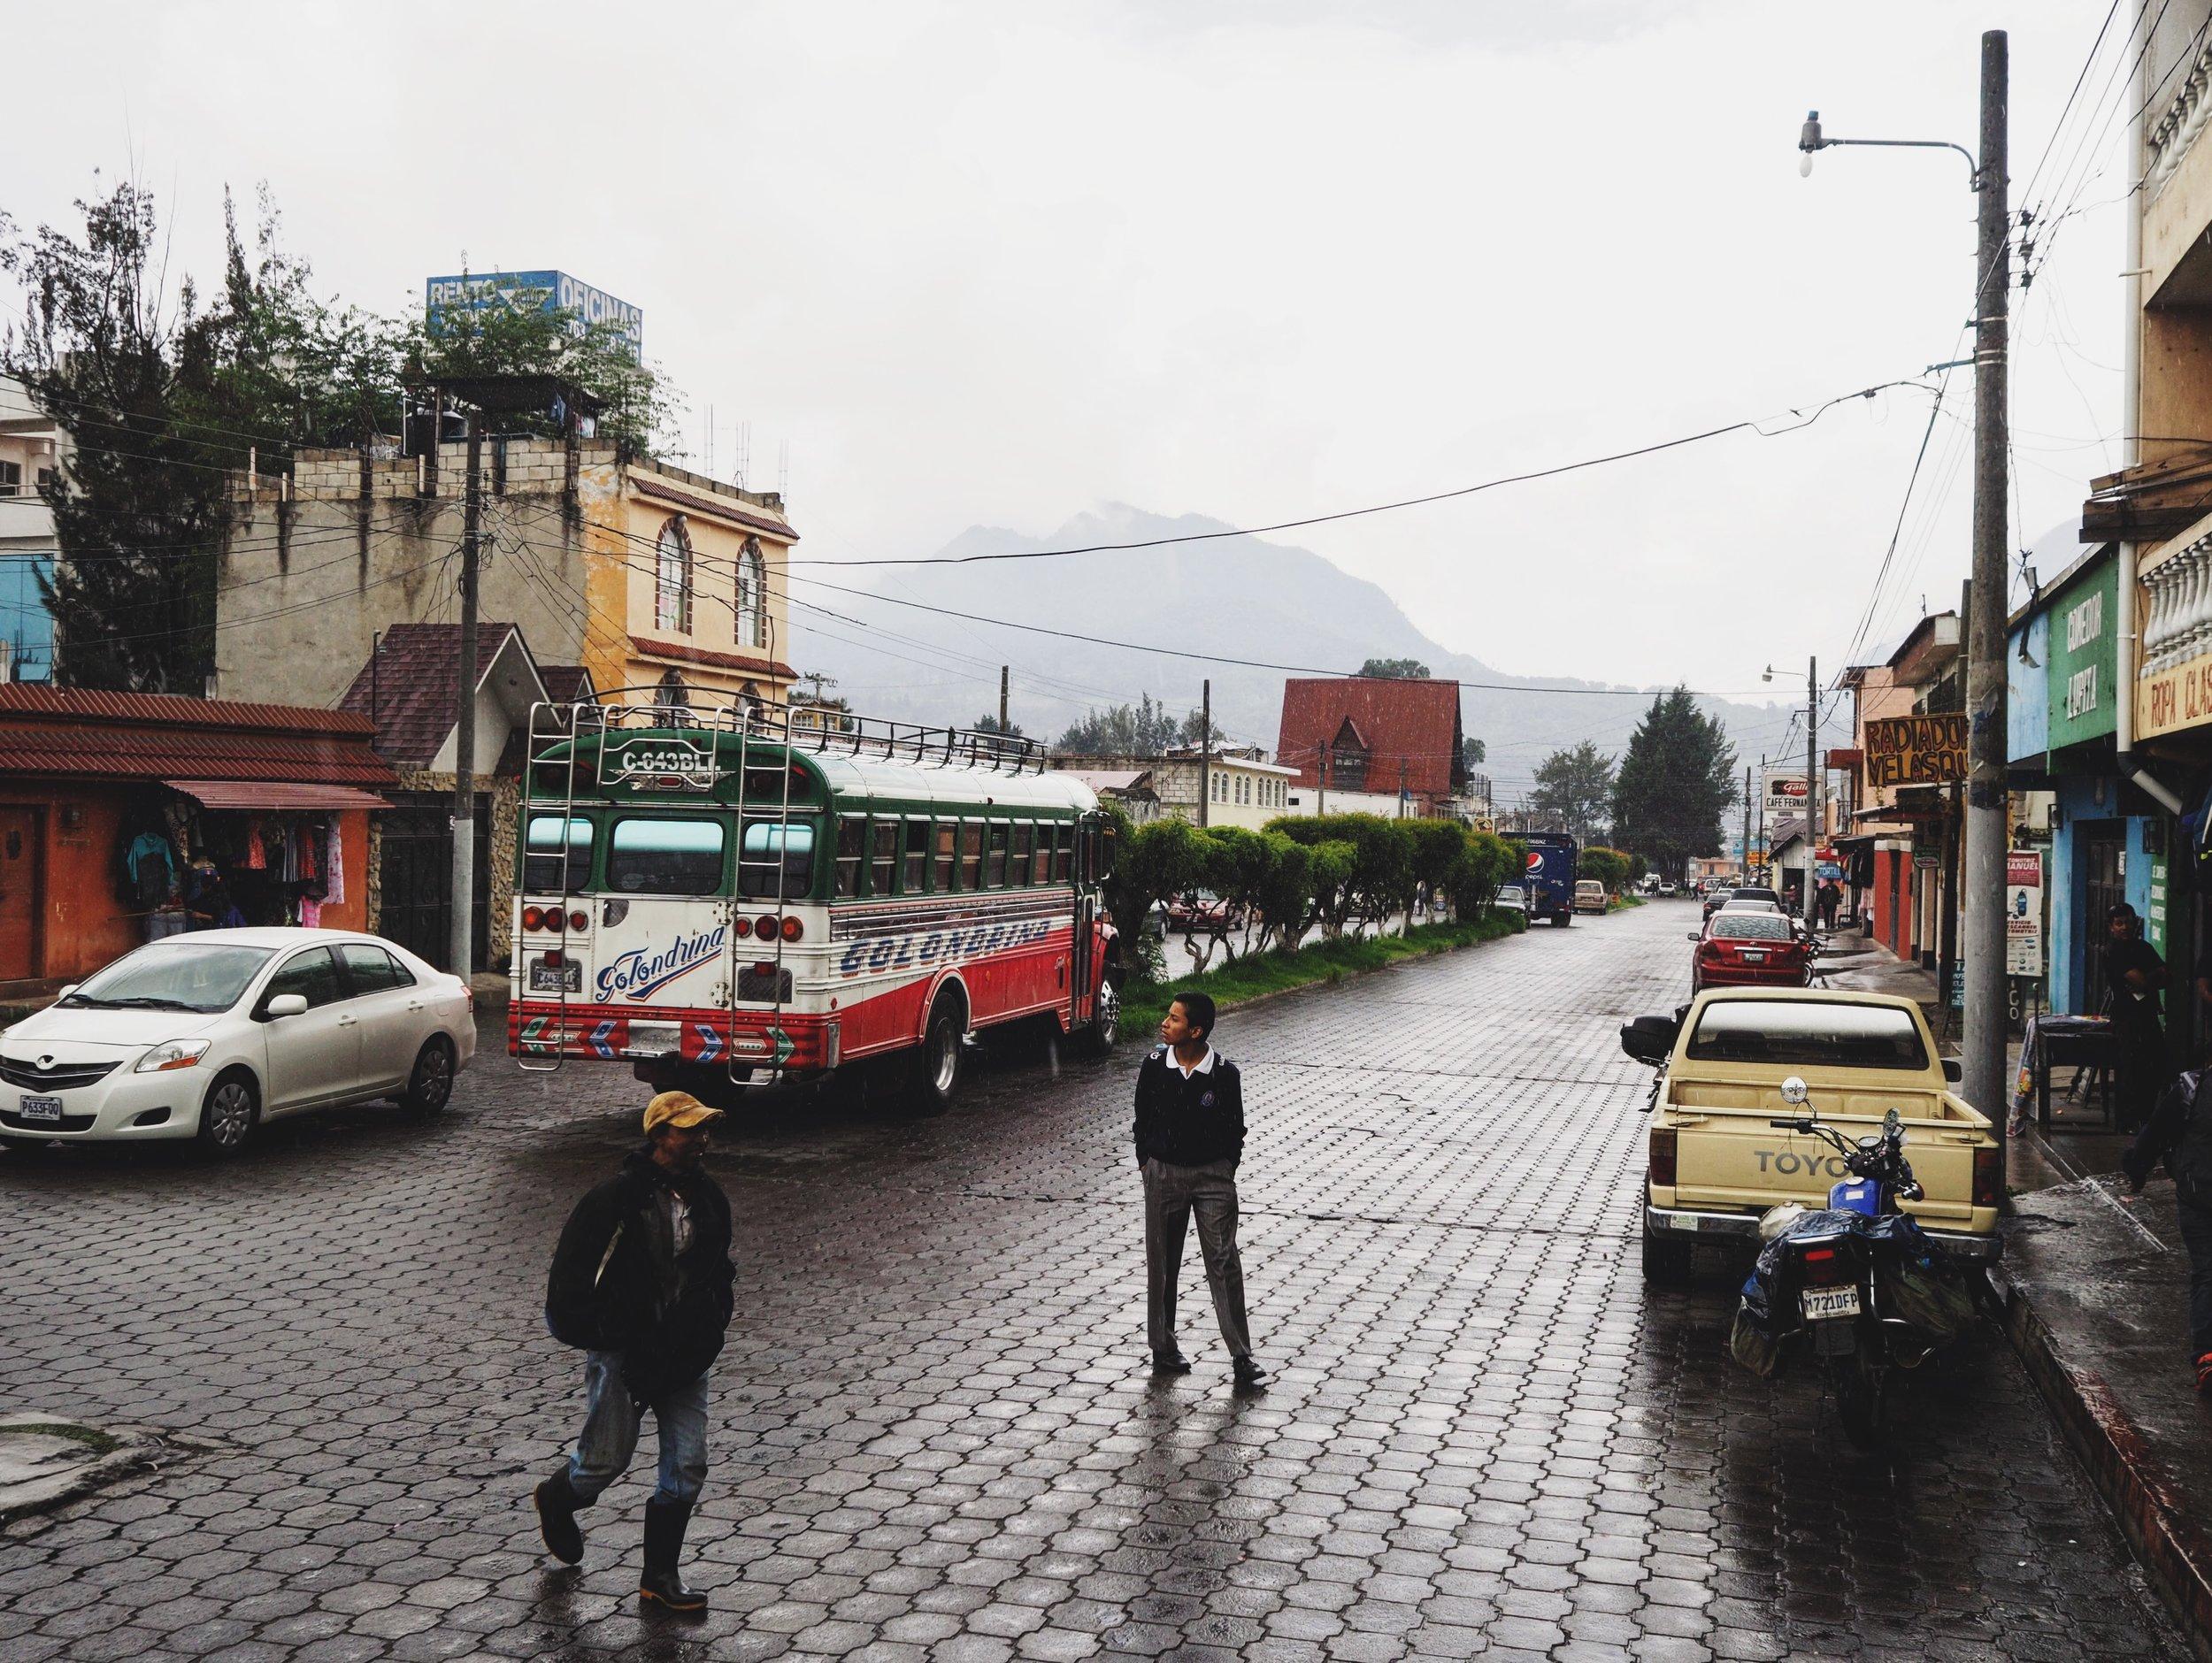 Street scenes in Xela